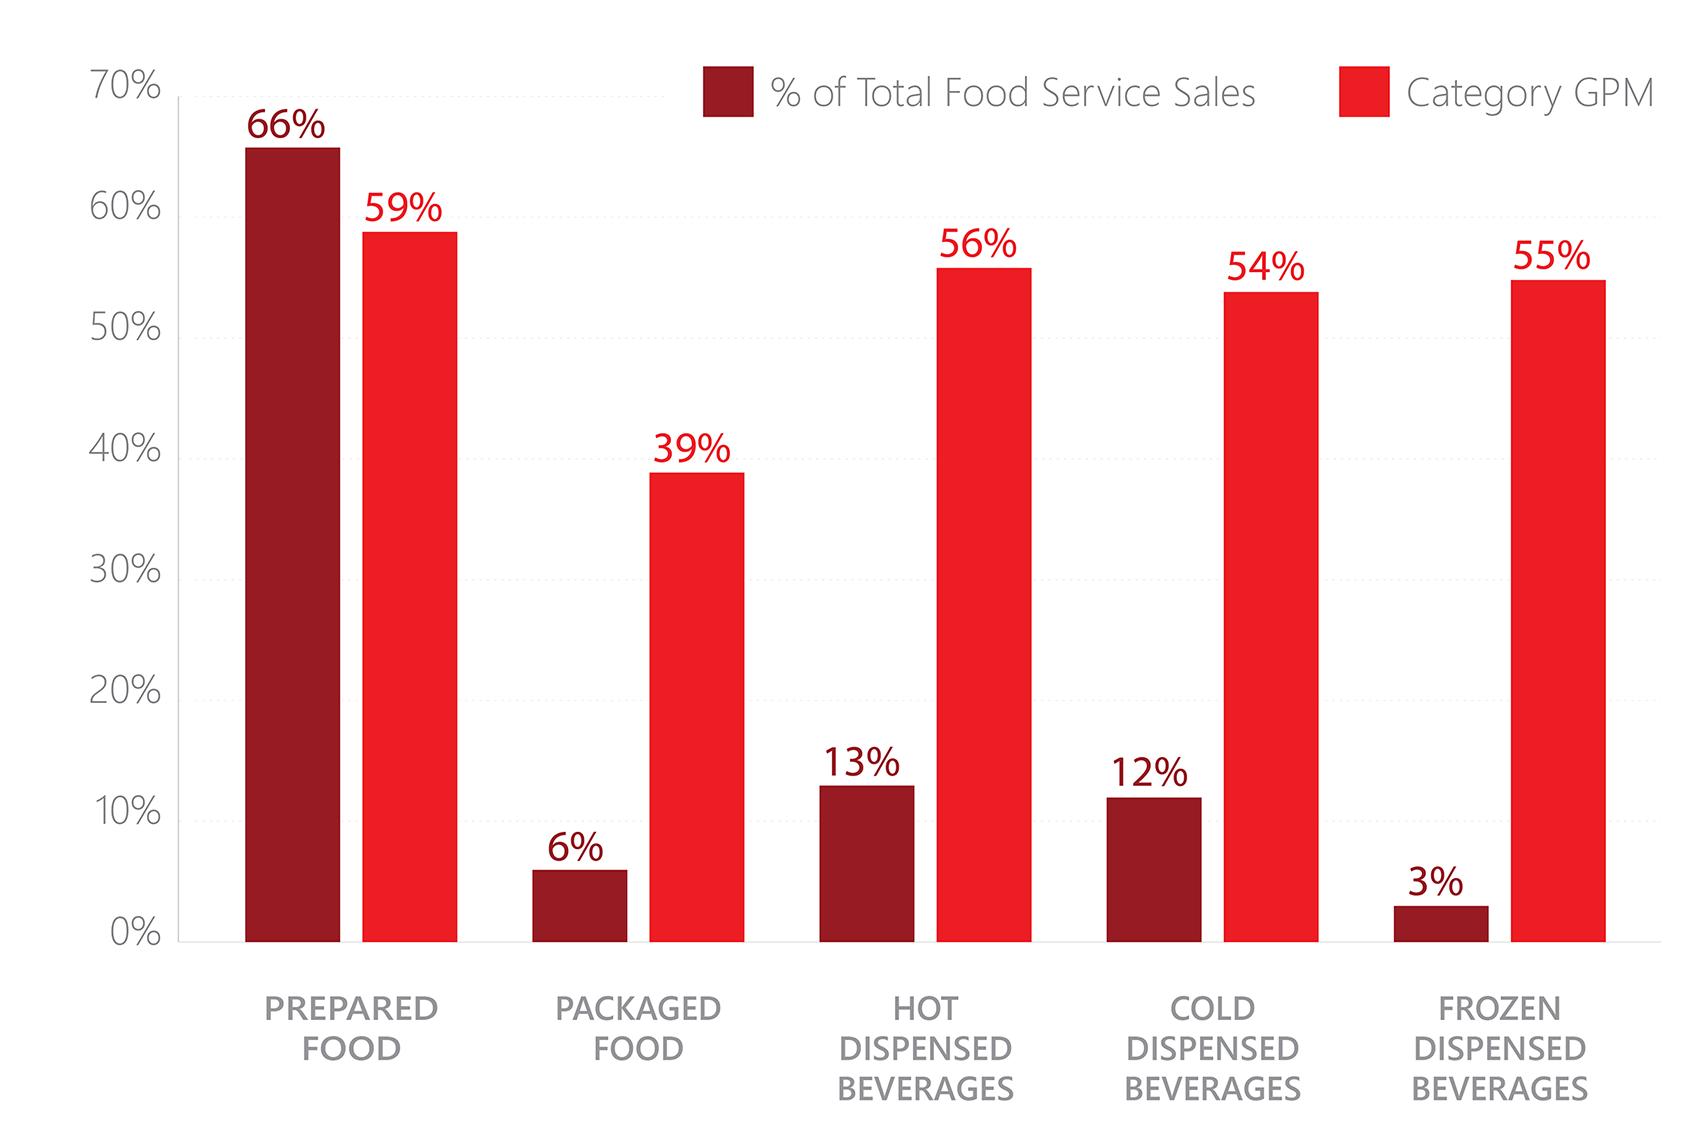 C-Store Food Service Sales and Margins (total food service sales): Prepared food - 66%; Packaged food - 6%; Hot dispensed beverages - 13%; Cold dispensed beverages - 12%; Frozen dispensed beverages - 3%.